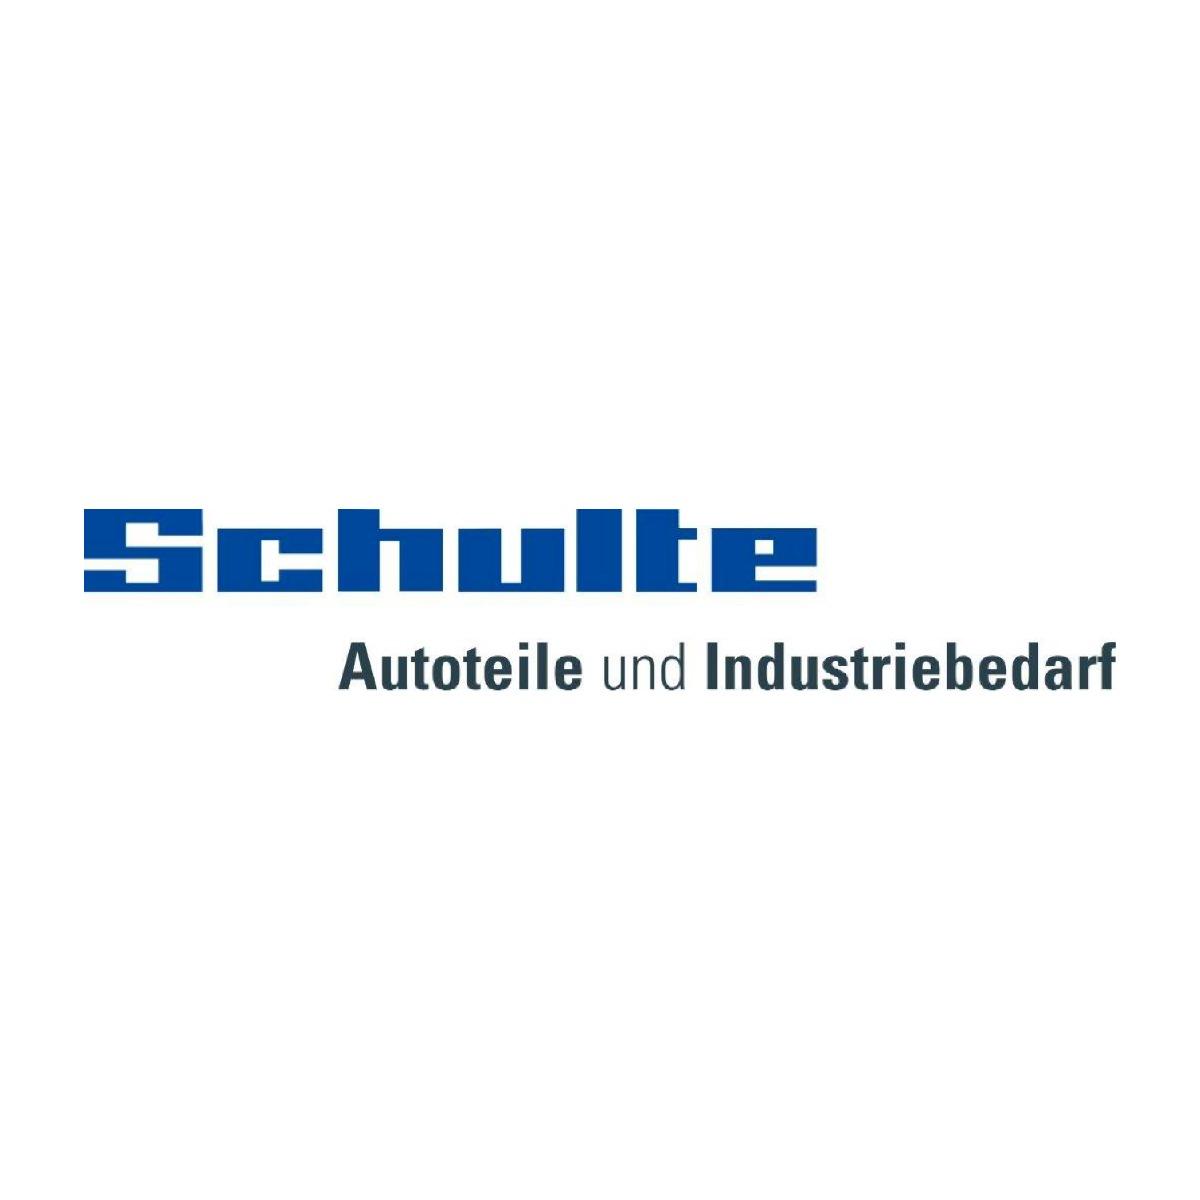 Hermann Schulte GmbH & Co. KG